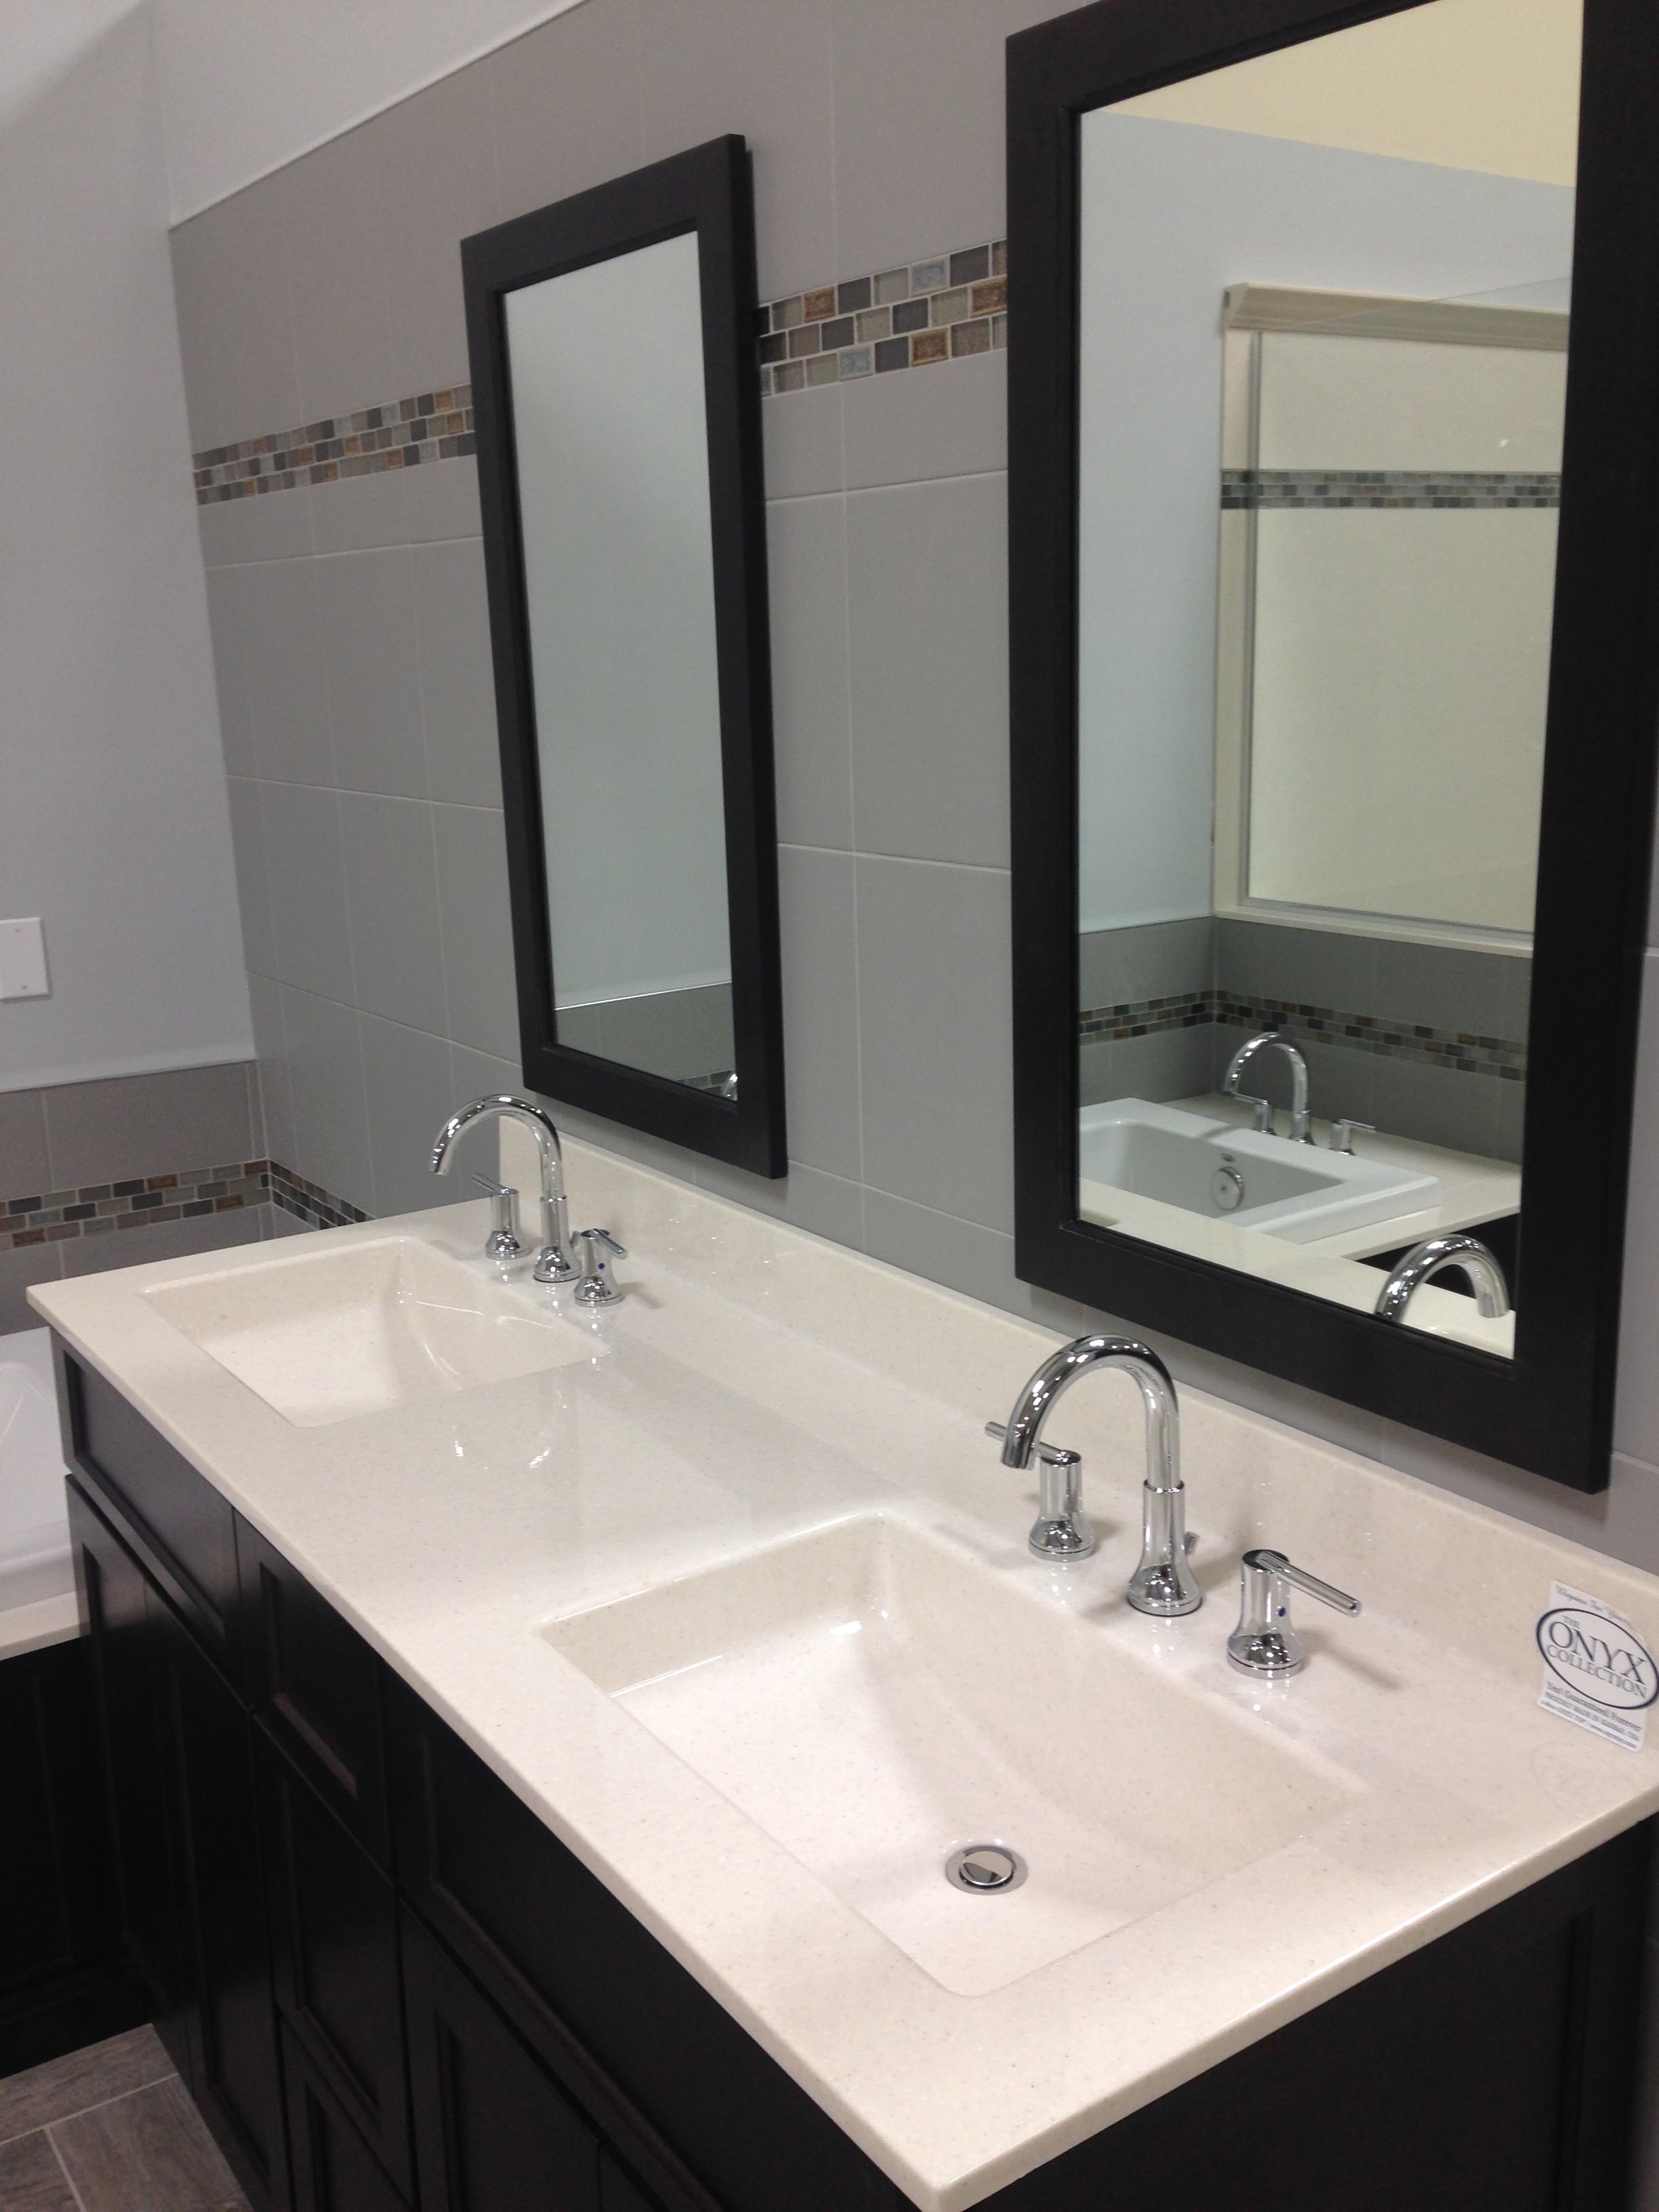 Modern Master Bath Display Affordable Kitchens And Baths